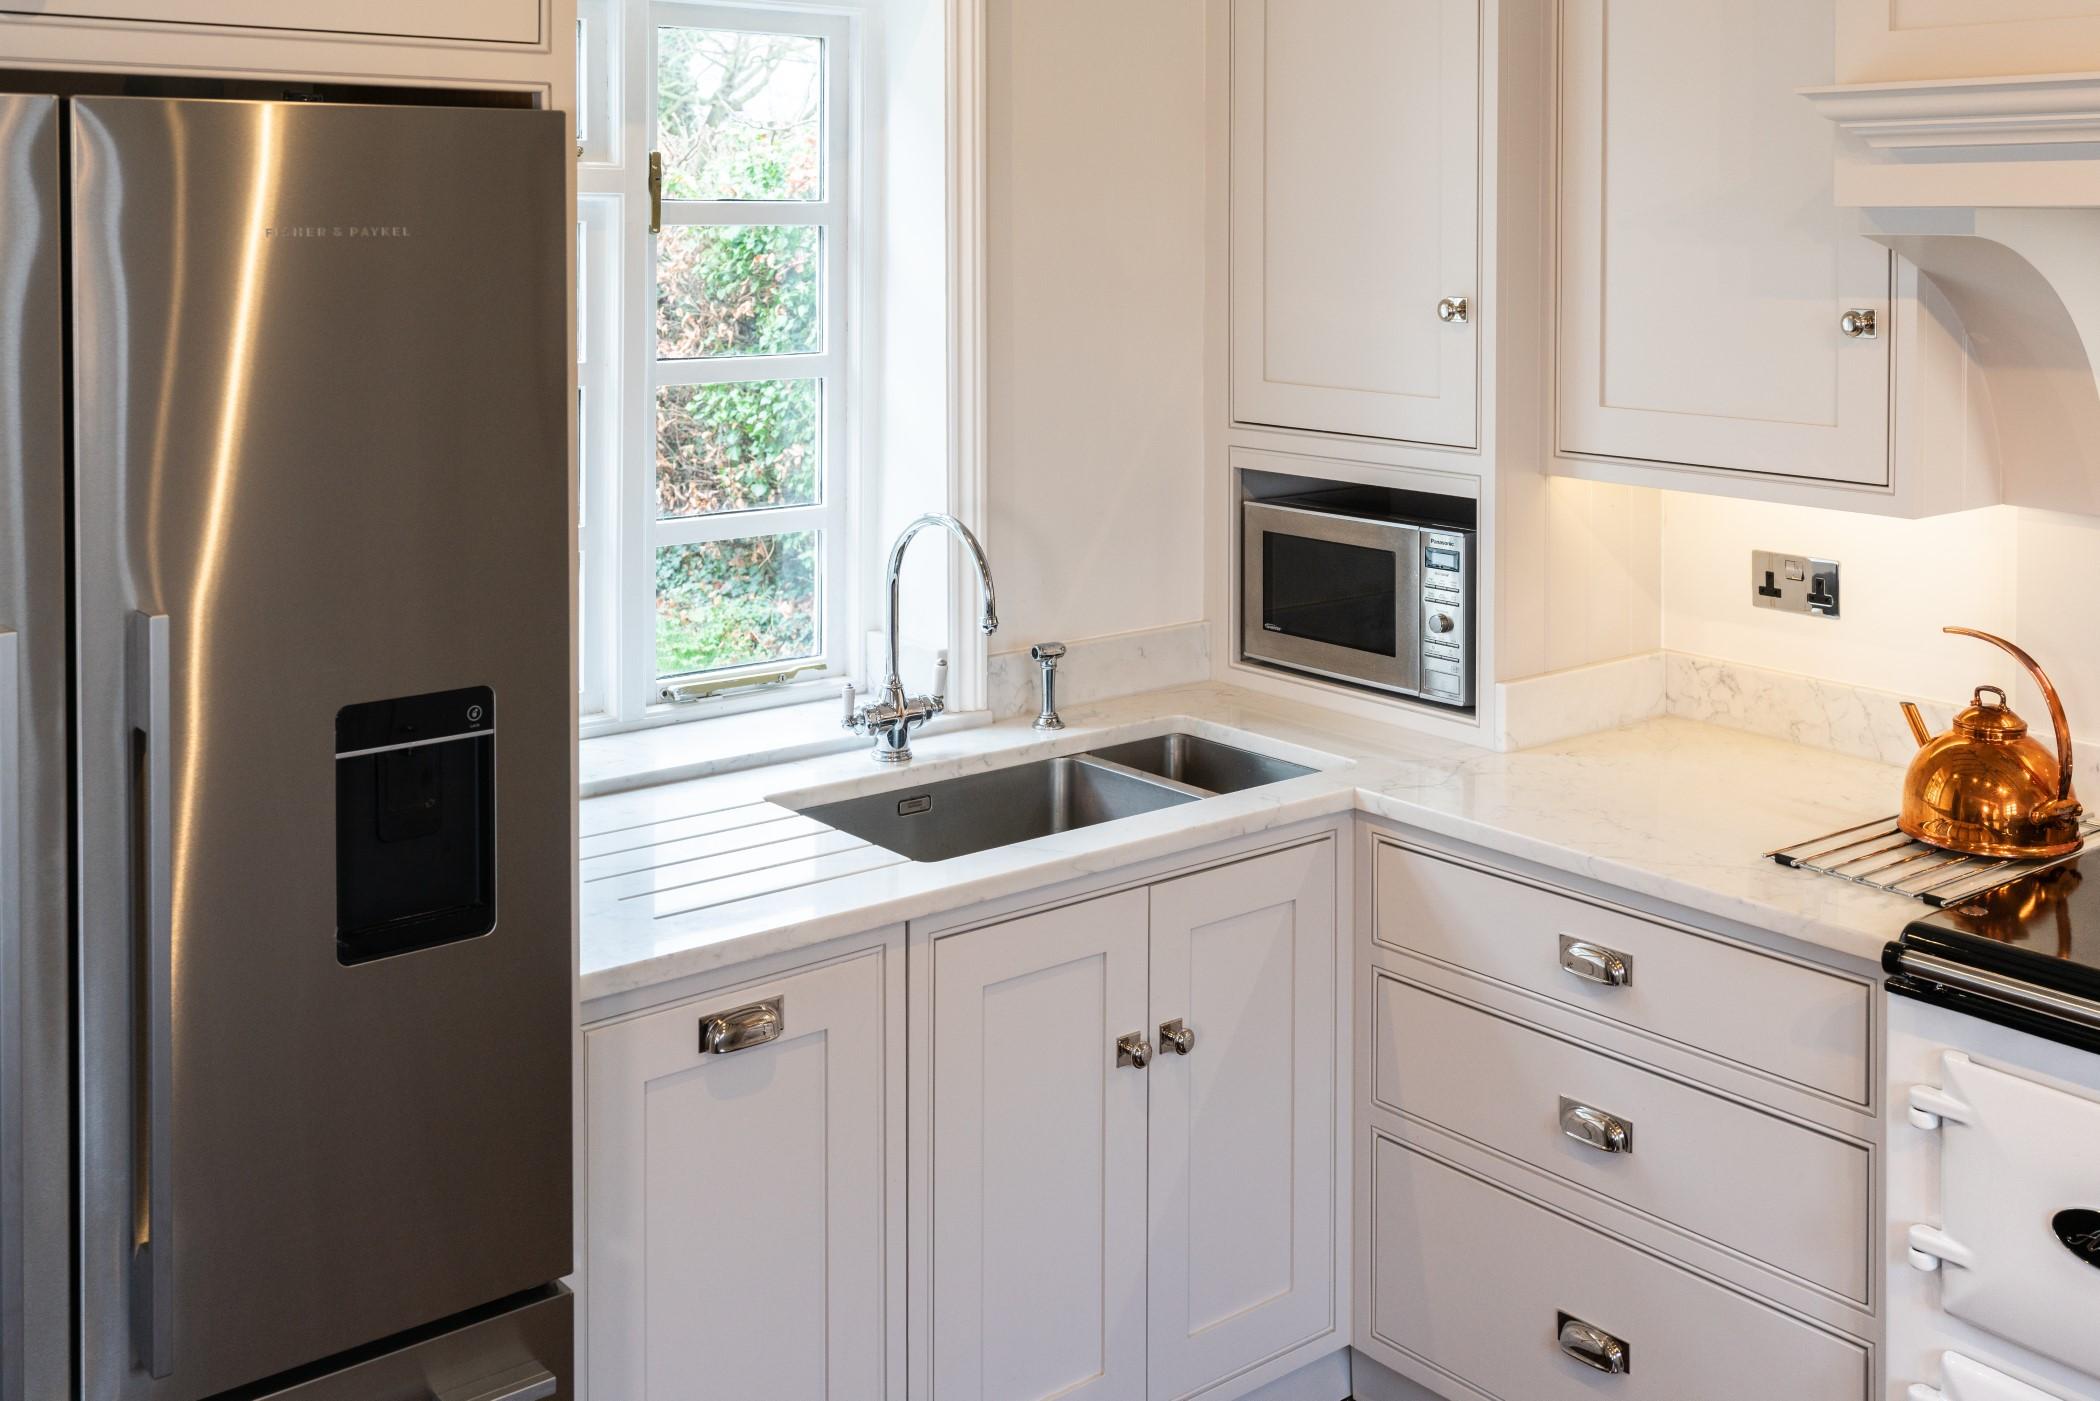 Choosing The Right Sink For Your Handmade Kitchen Nicholas Bridger